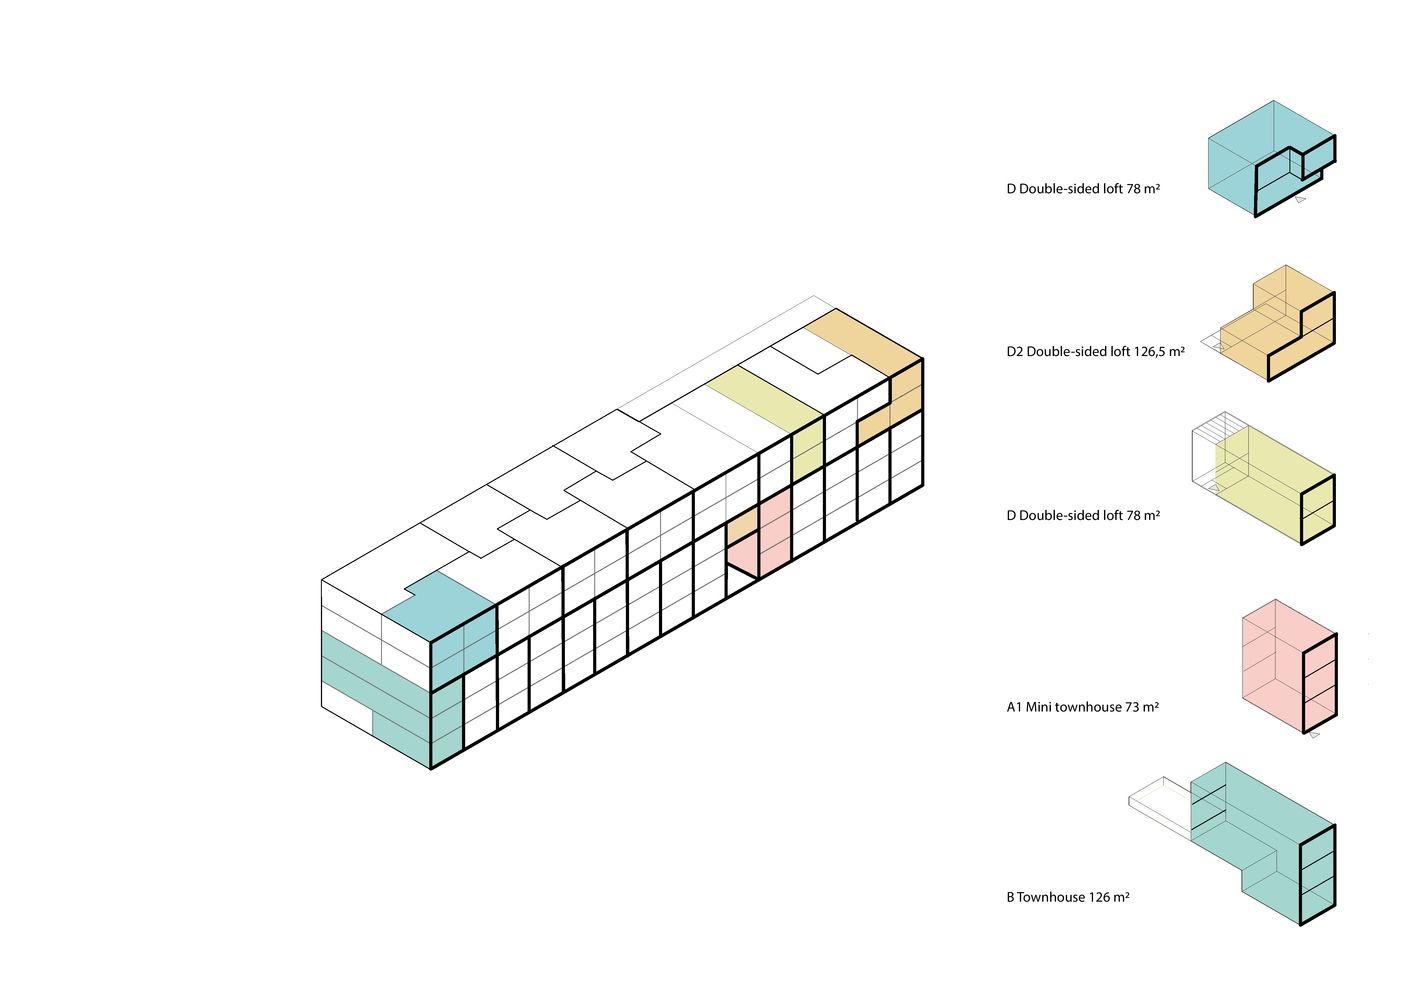 Gallery Of Superlofts Blok Y Marc Koehler Architects 38 In 2020 Architecture Presentation Diagram Architecture Concept Architecture